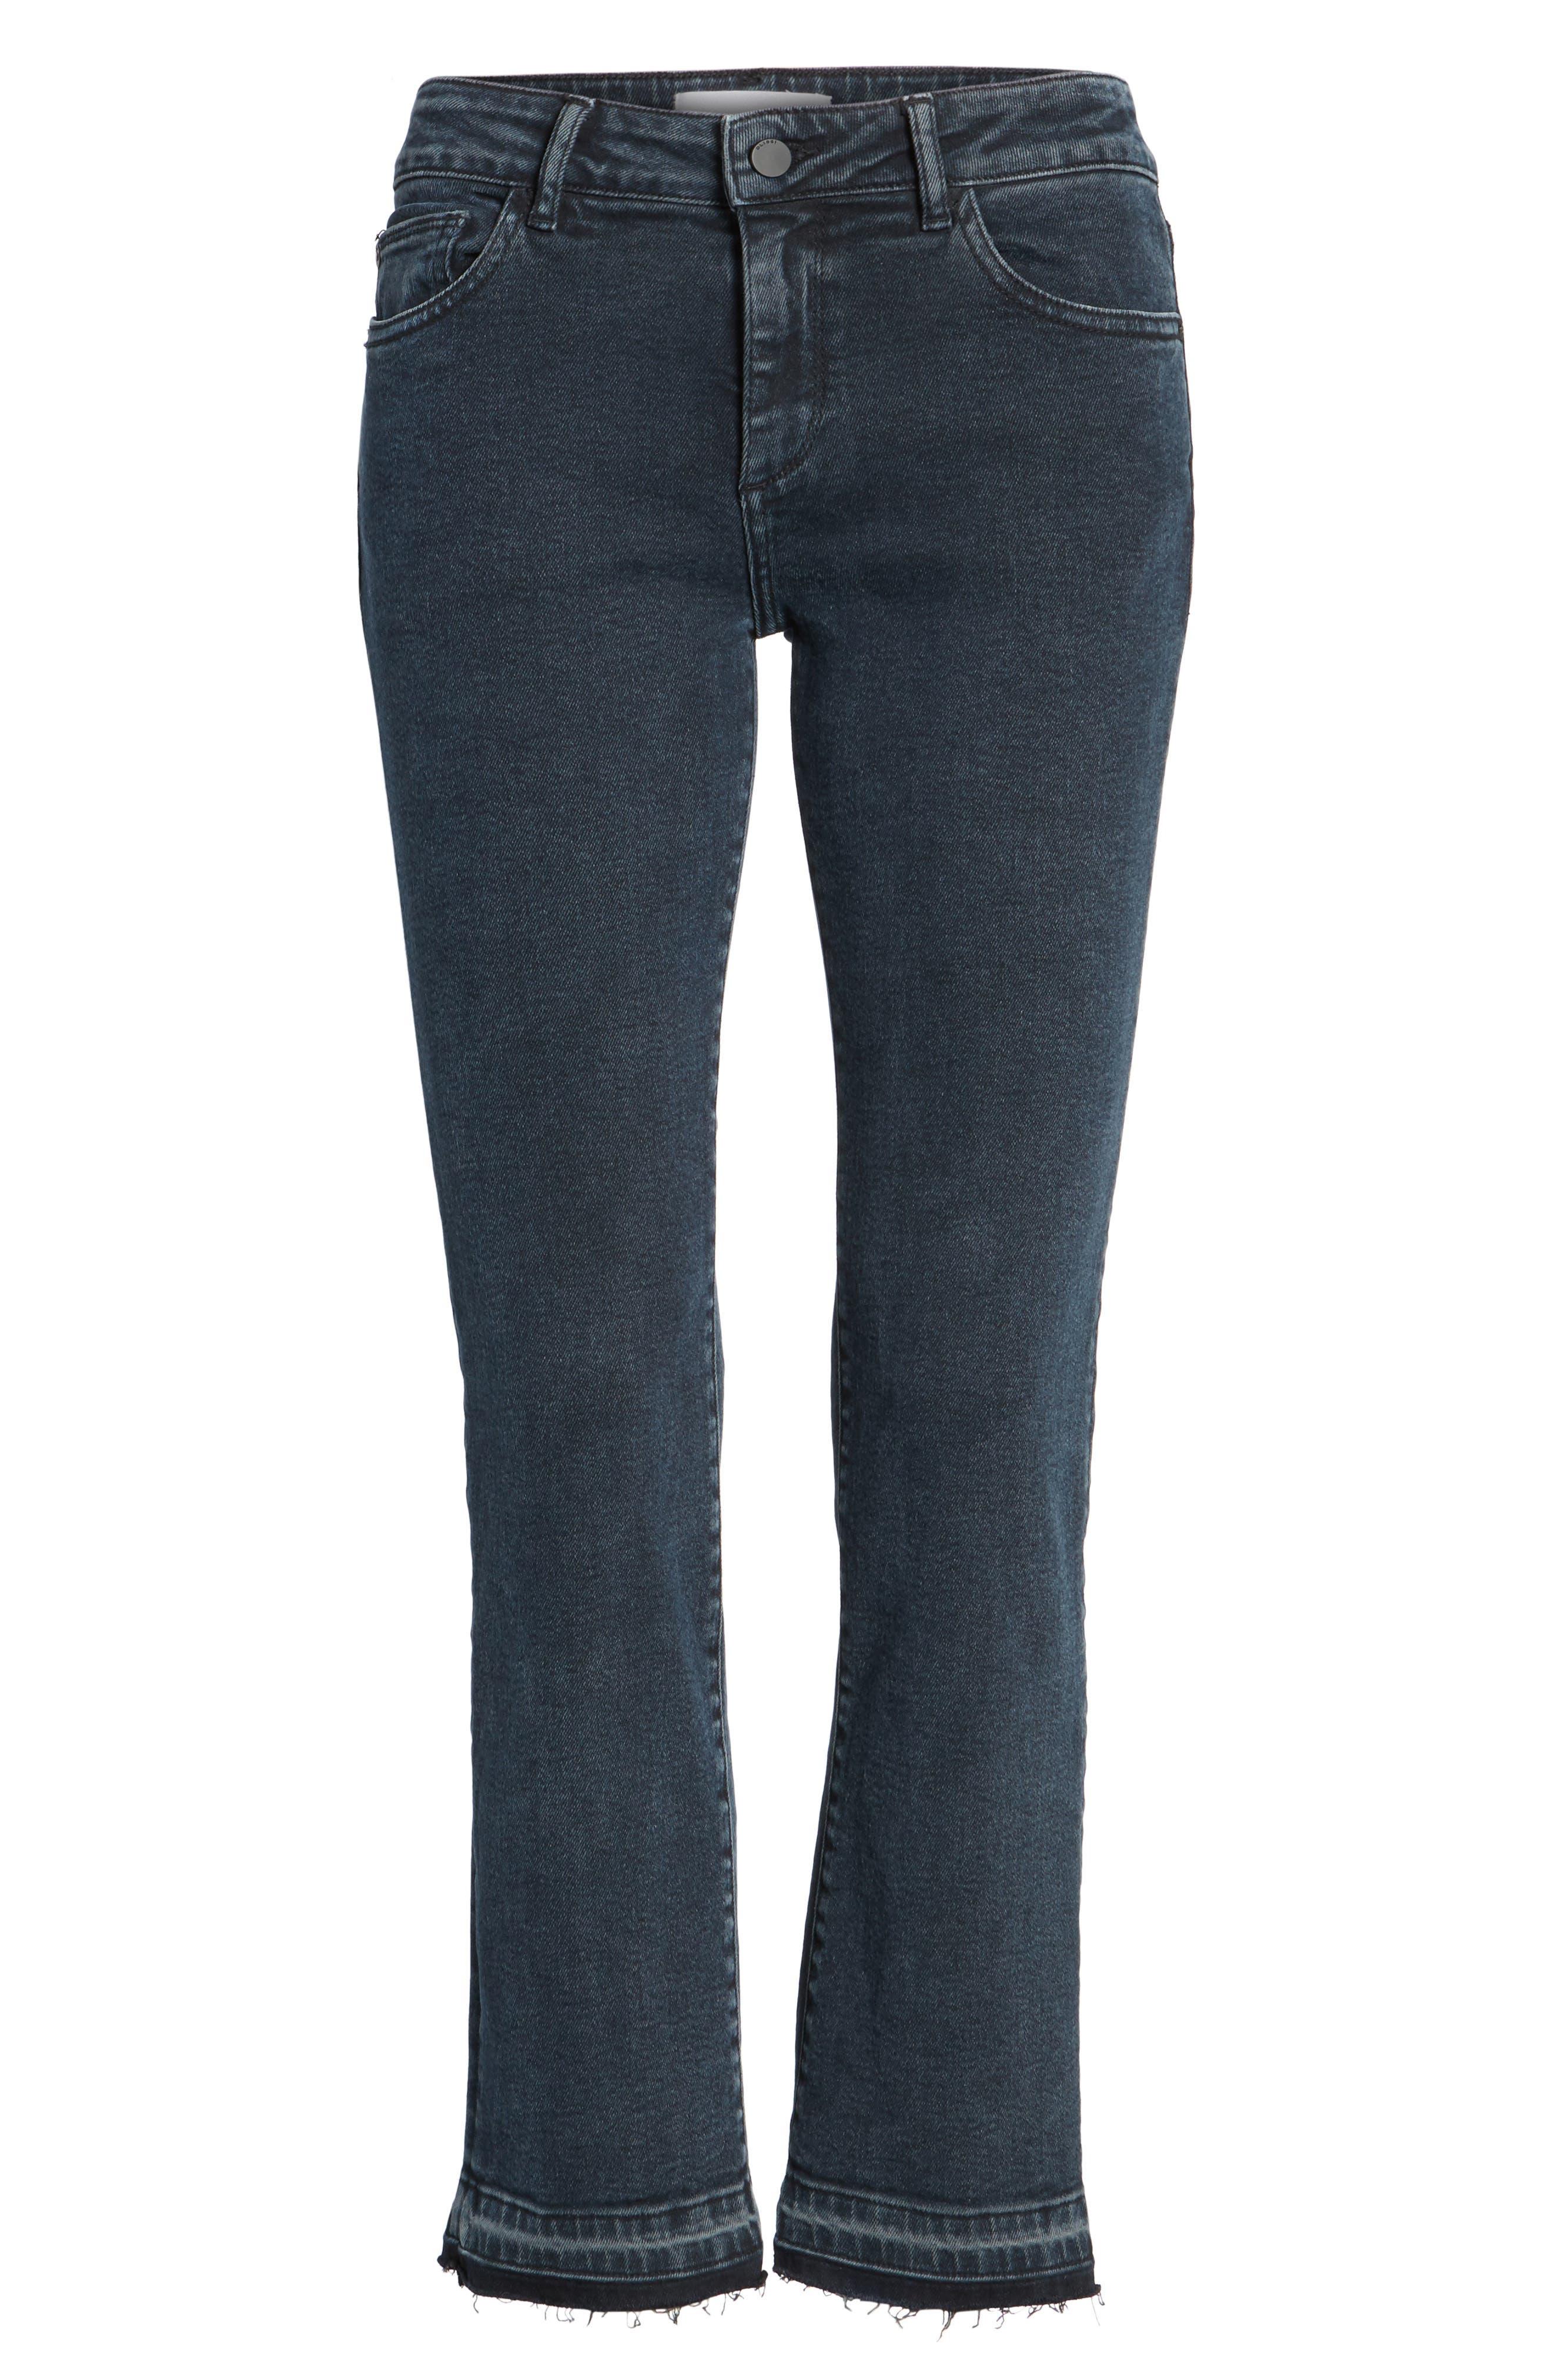 Mara Ankle Snap Straight Leg Jeans,                             Alternate thumbnail 6, color,                             416